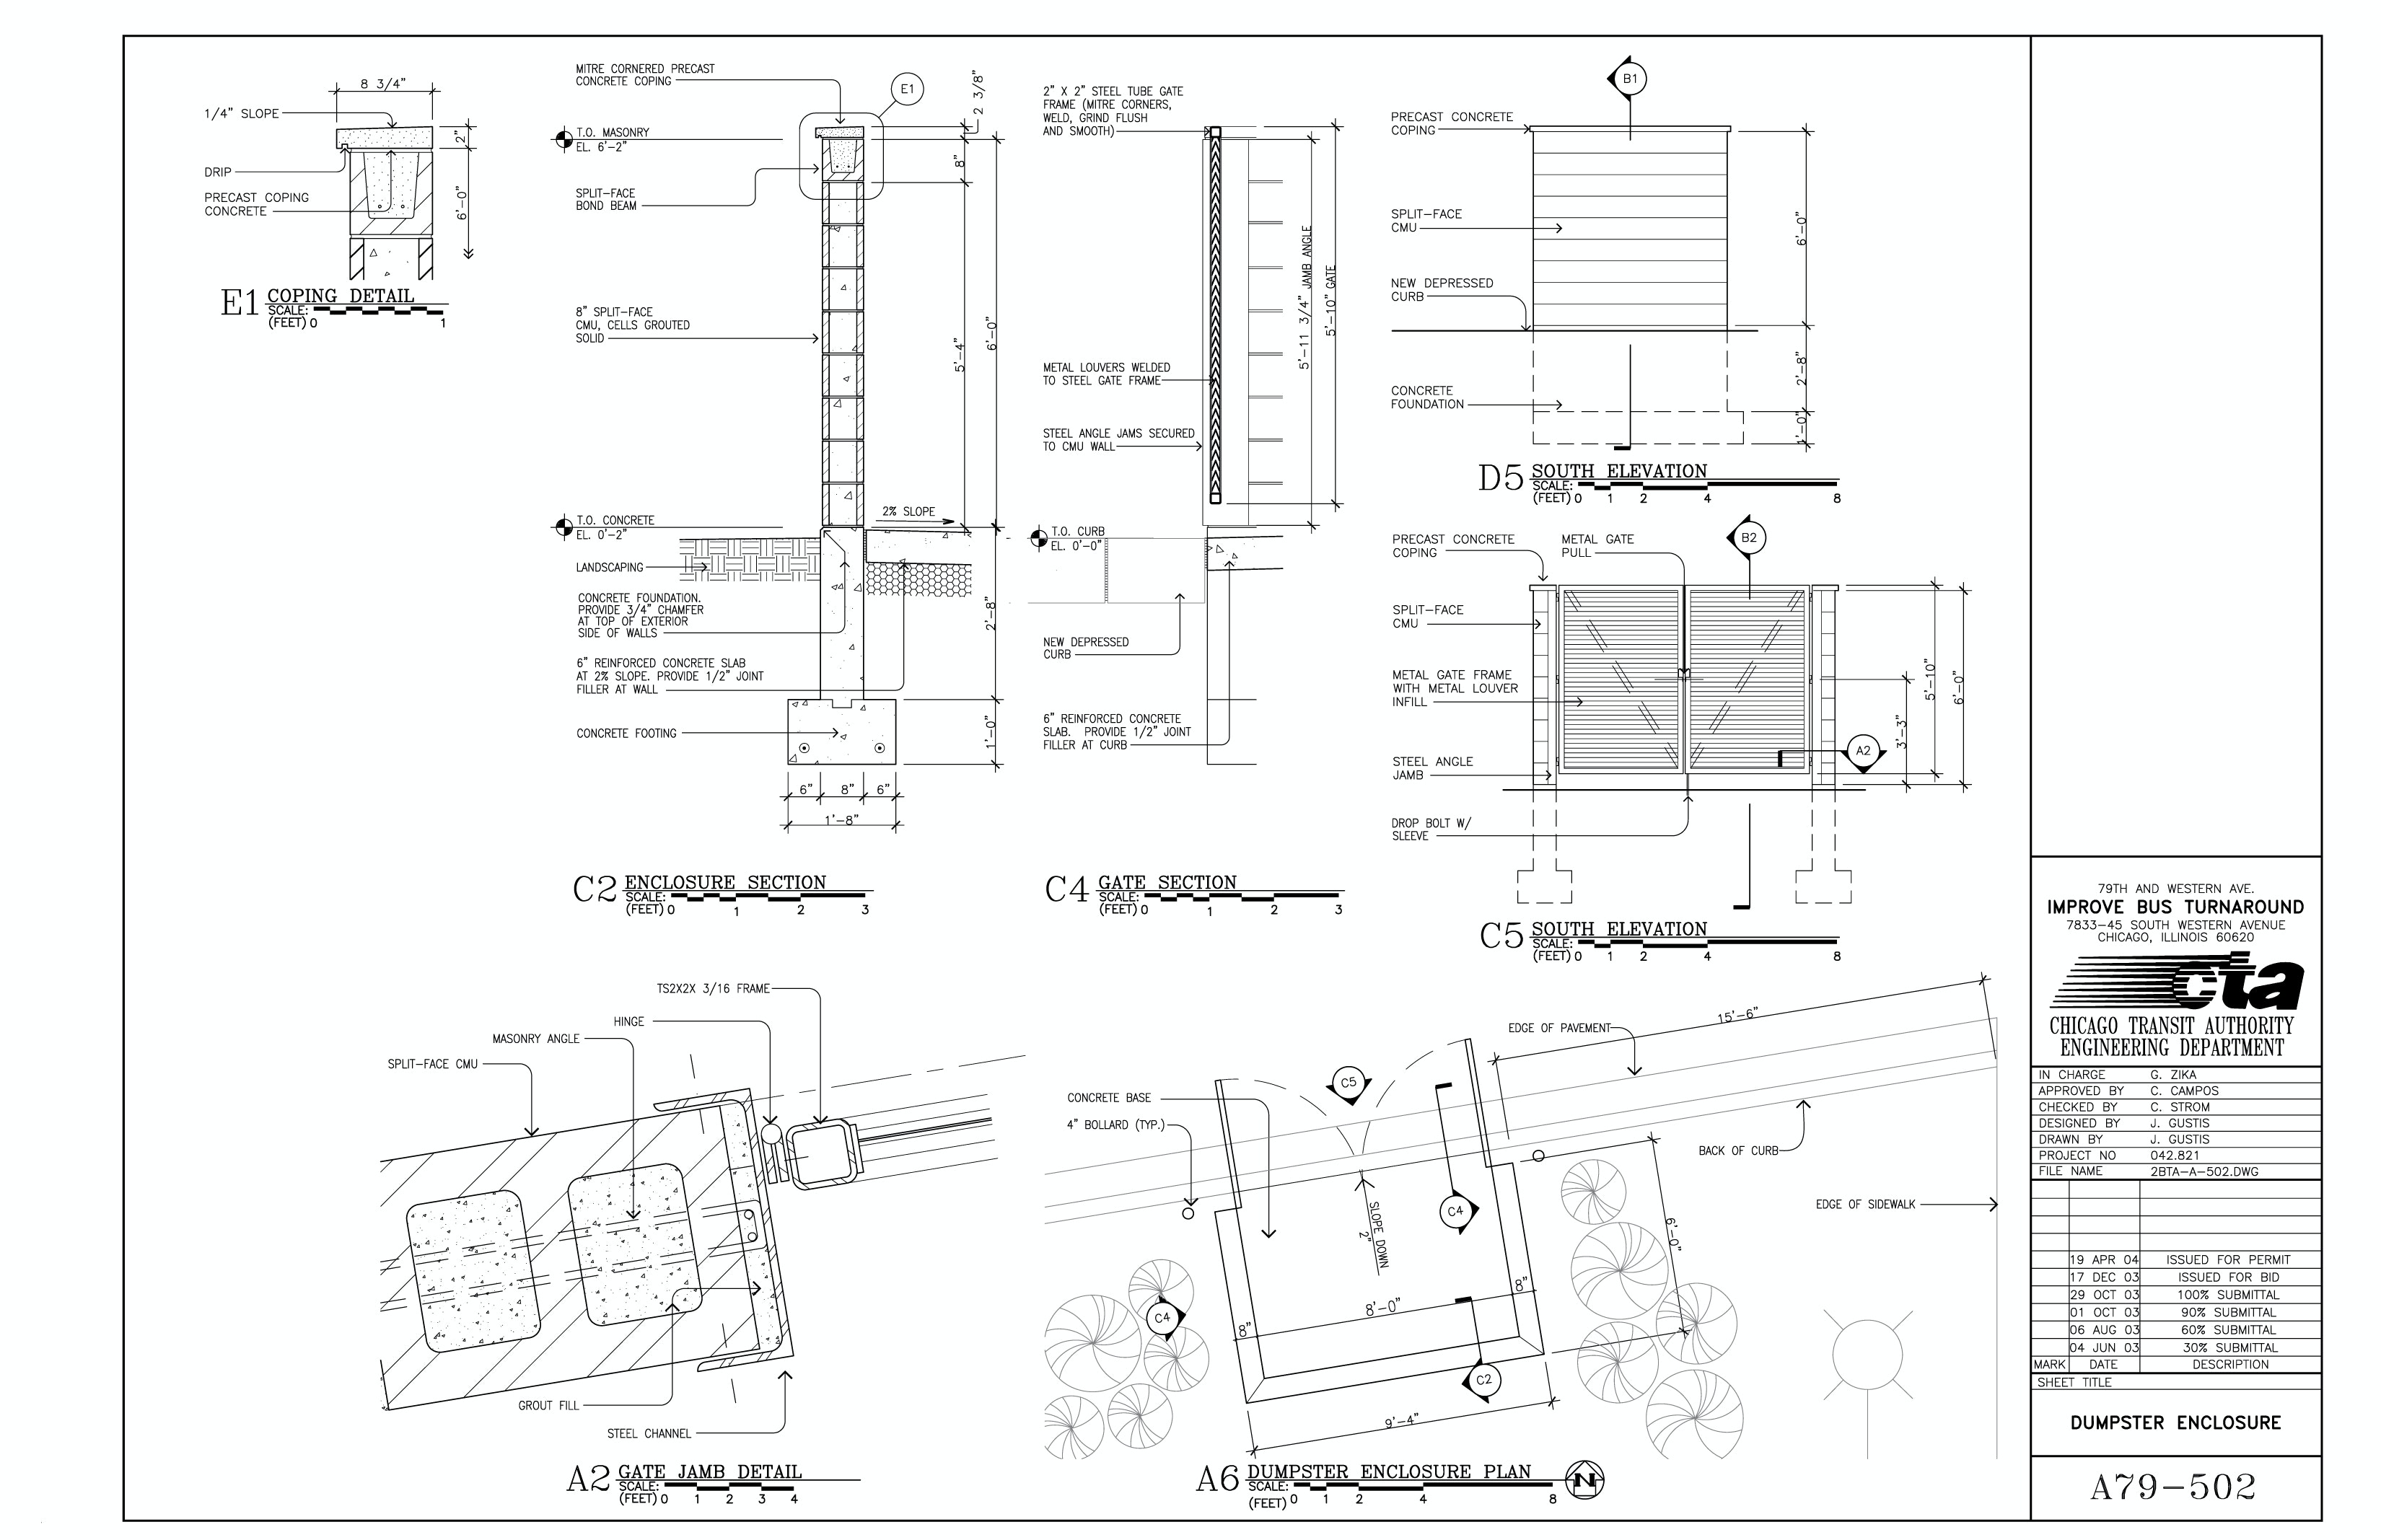 1ar3f9hk84l5cfip?auto\=compress%2Cformat 795h wiring diagram chevy wiring schematics \u2022 wiring diagrams j 3m opticom wiring diagram at eliteediting.co